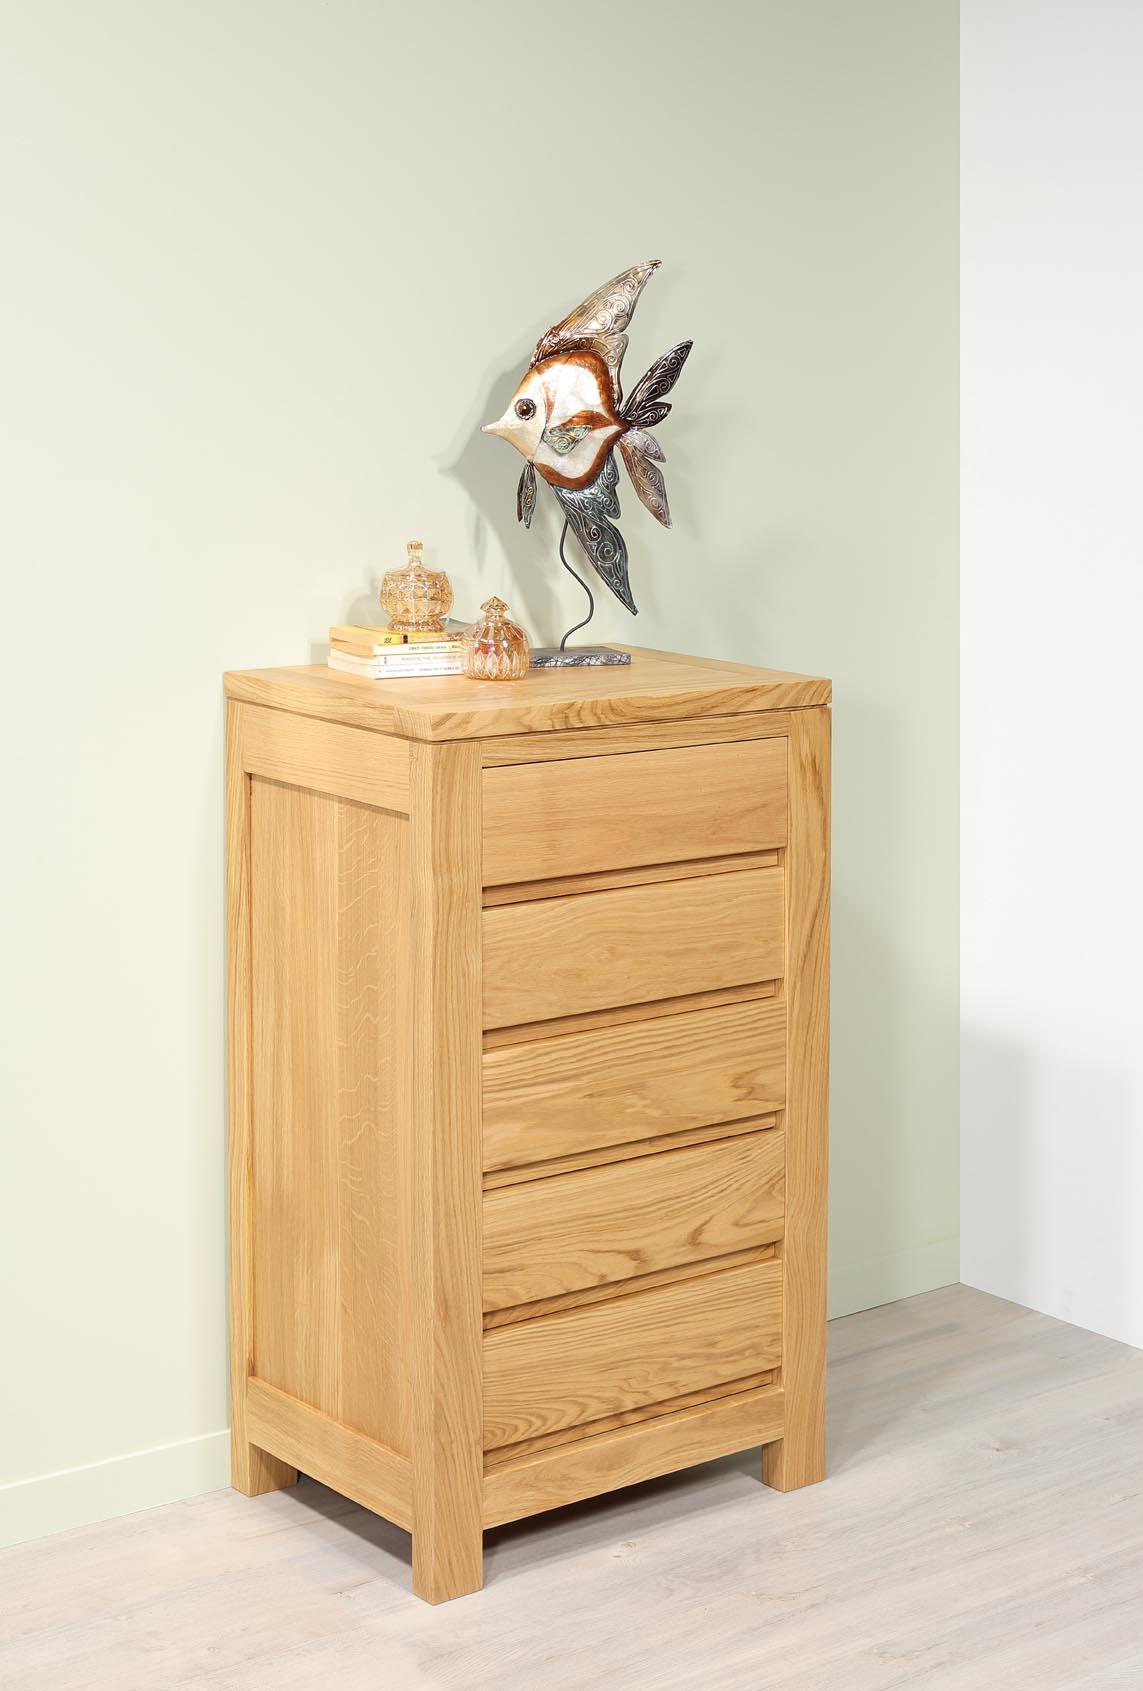 Commode Petite Profondeur 30 Cm petite commode 5 tiroirs collection nature en chêne massif